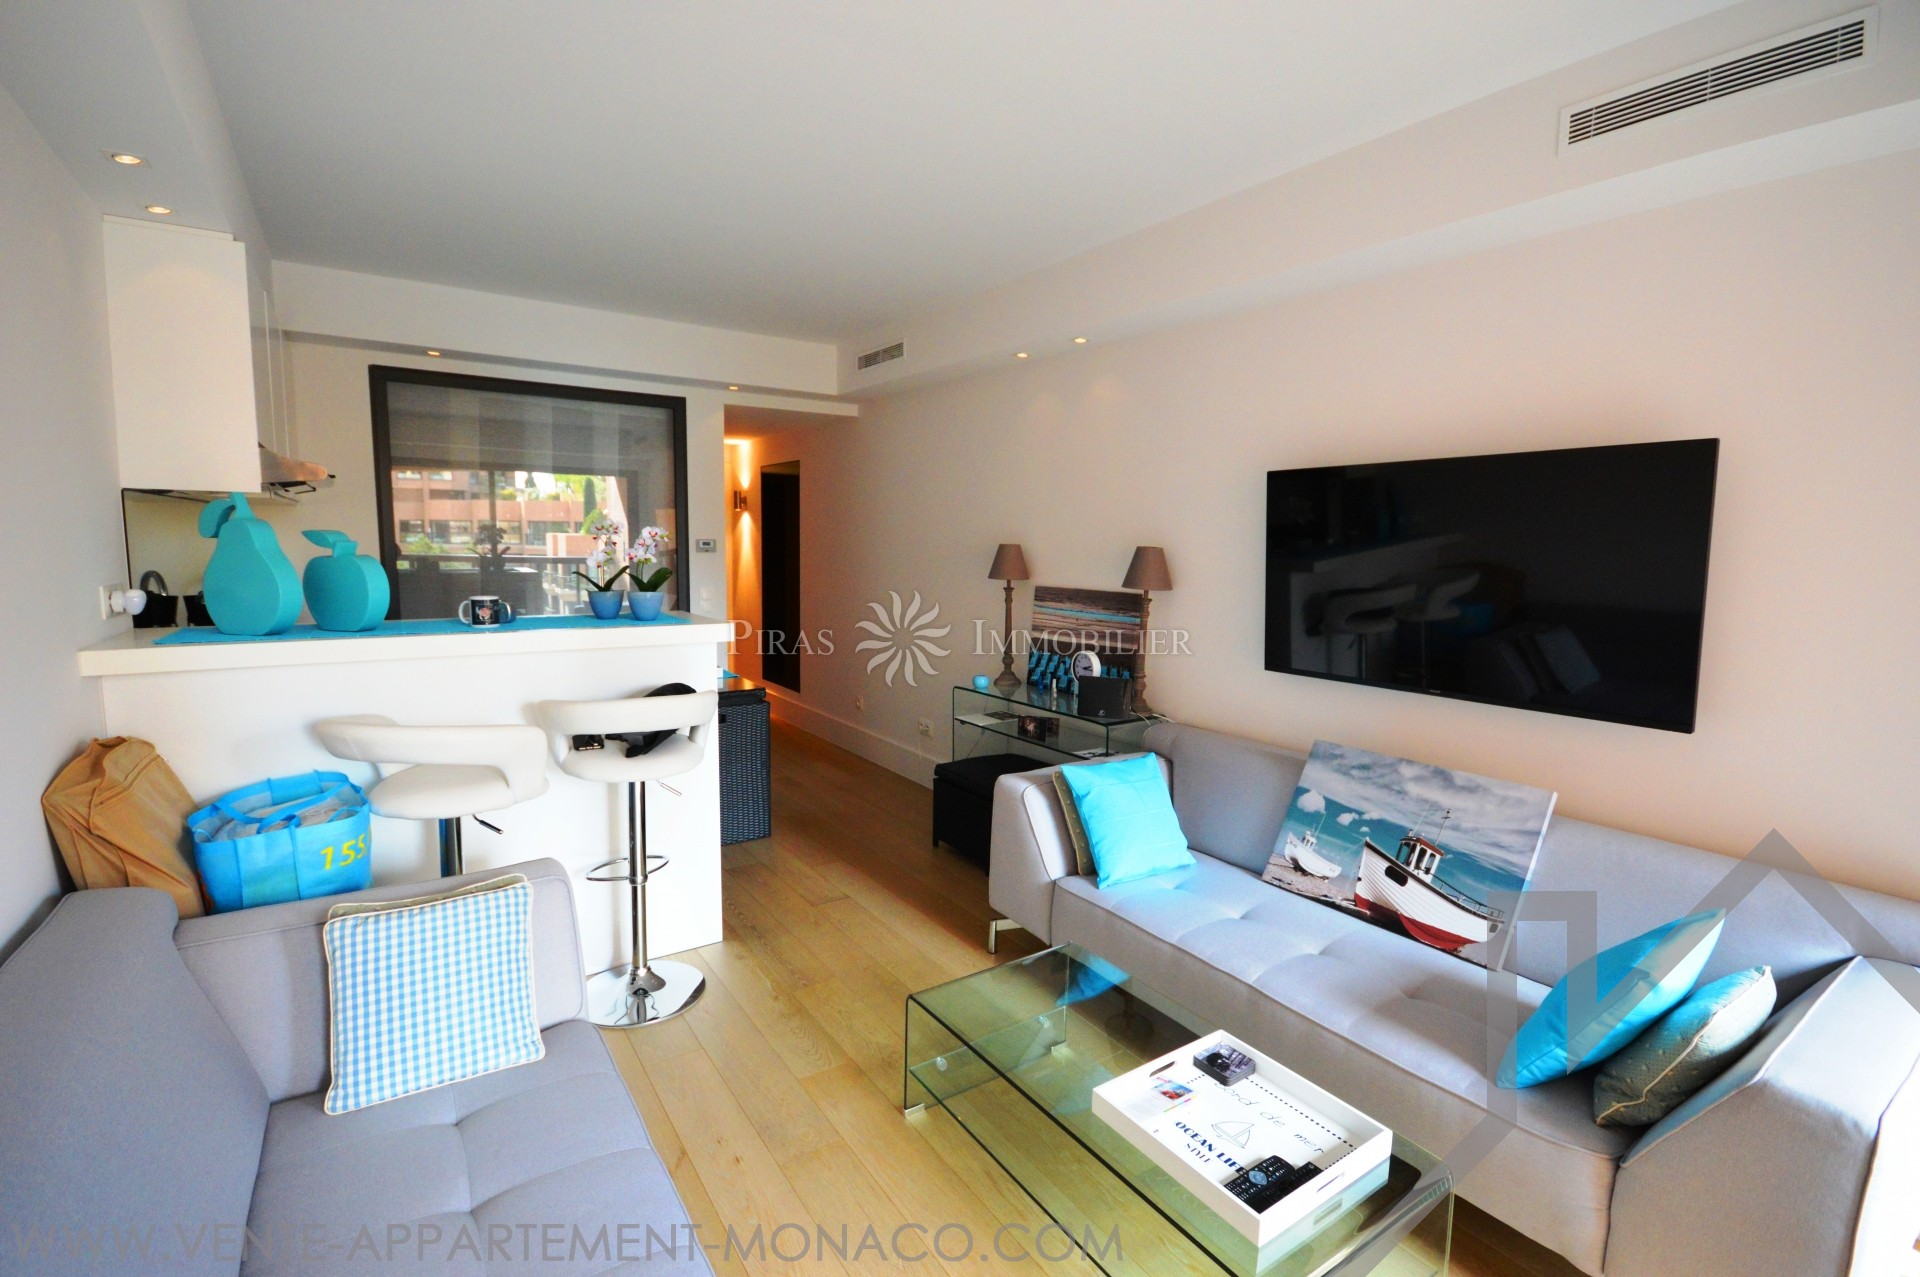 Beau studio renove r sidence avec piscine propri t s - Residence avec piscine interieure ...